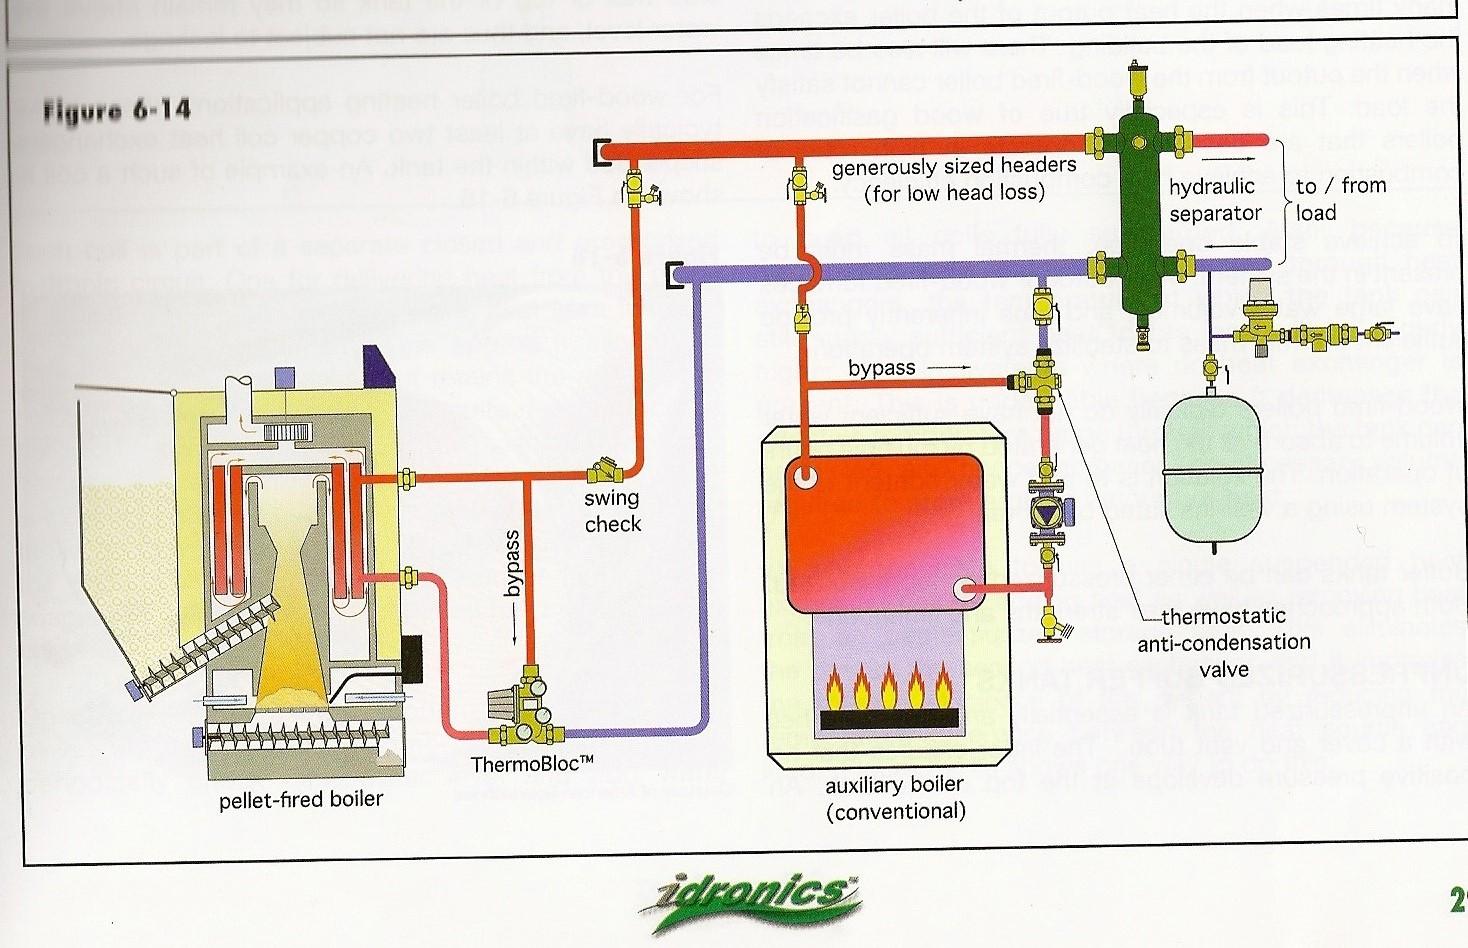 662d352a0d3055464ef351a6d7759d?resize\=665%2C429\&ssl\=1 diagrams evergreen motor wiring diagram genteq evergreen ge ecm x13 motor wiring diagram at gsmx.co